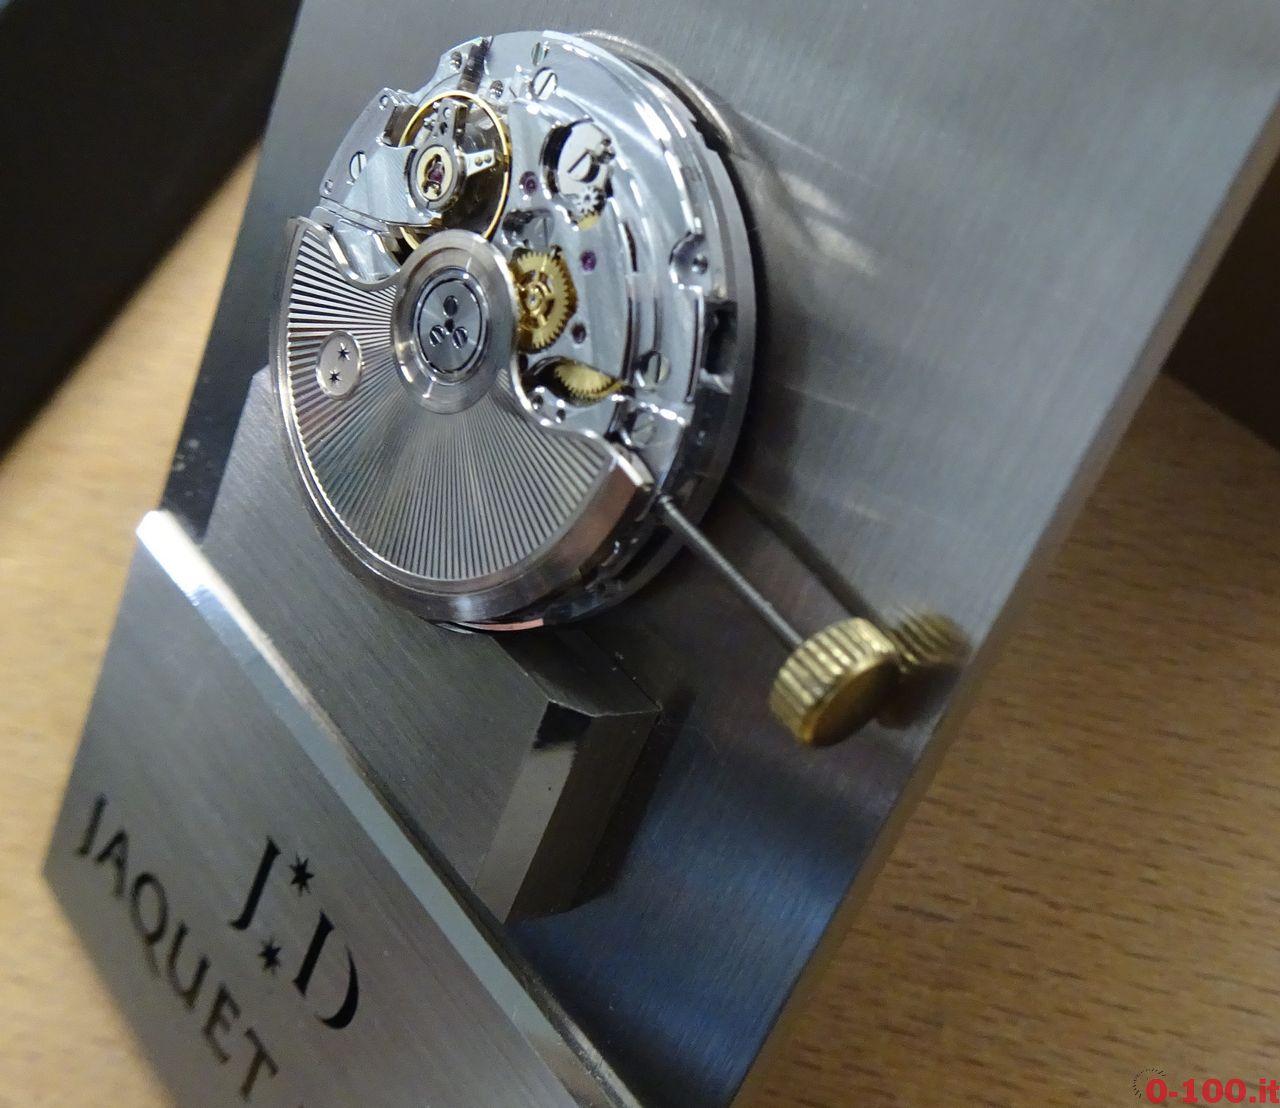 gli-speciali-di-0-100-it-jaquet-droz-la-manifattura-di-la-chaux-de-fonds_0-10064